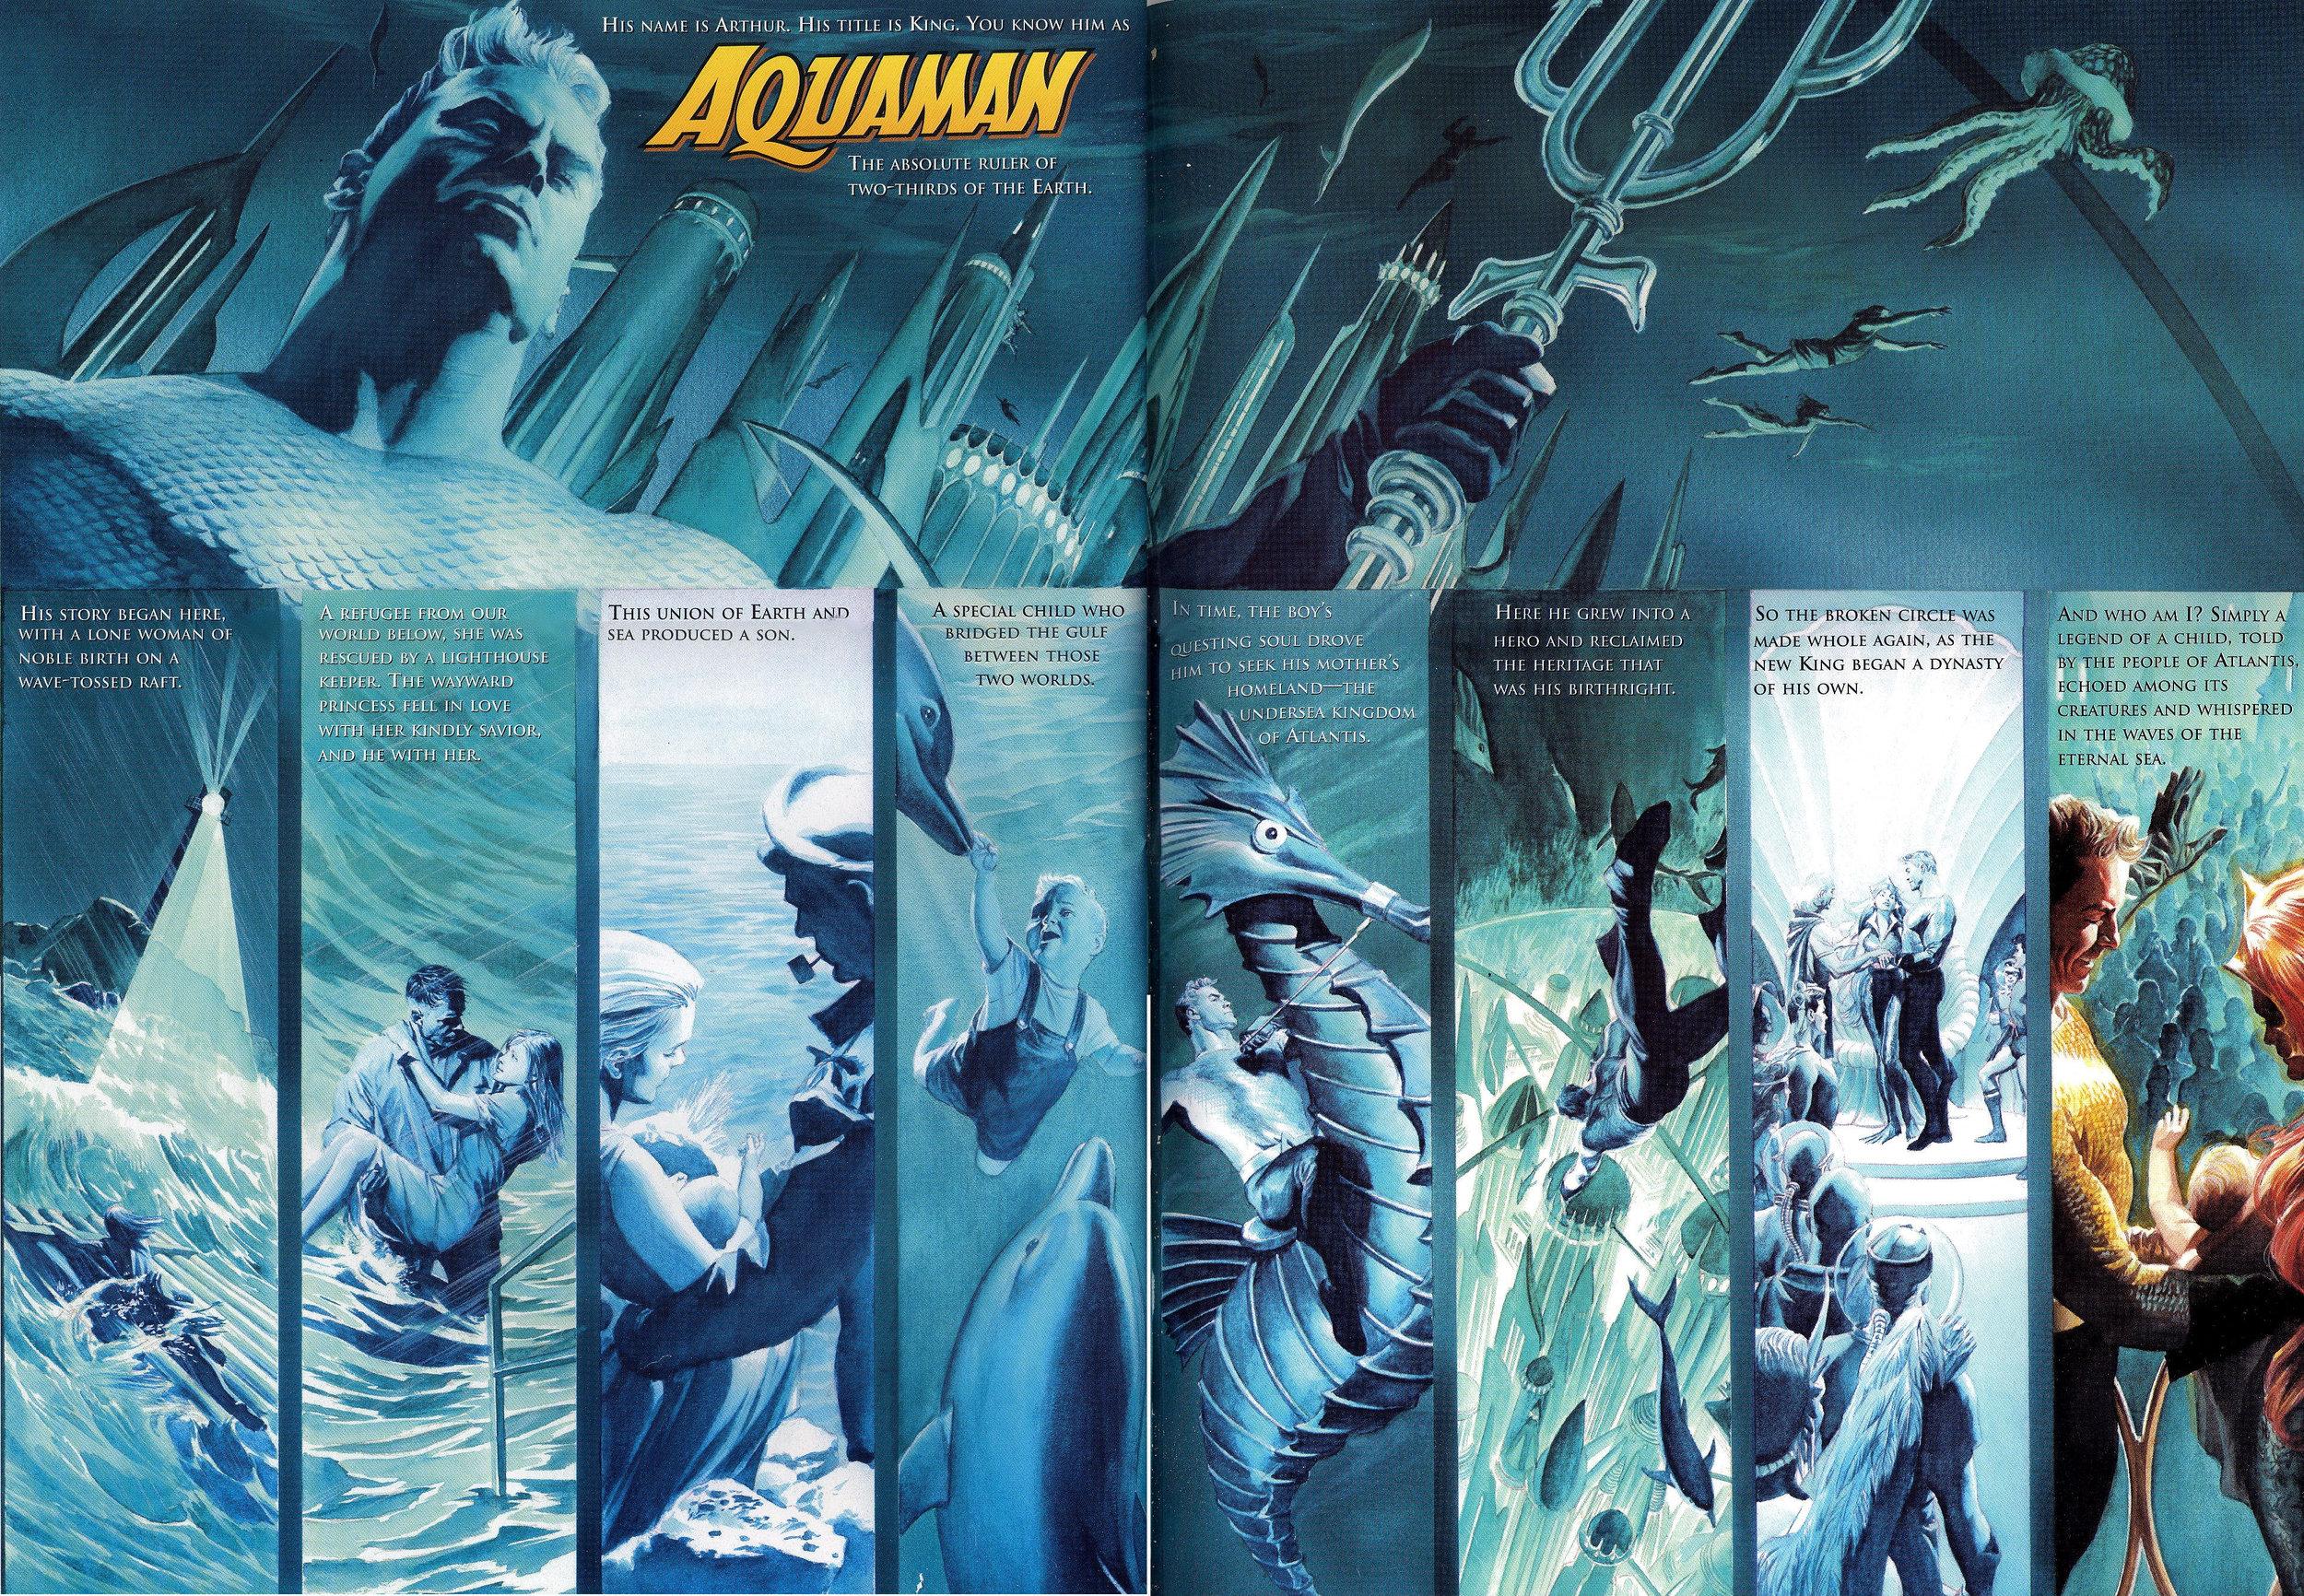 JLA: Secret Origins (2002) Aquaman, written by Paul Dini with art by Alex Ross.